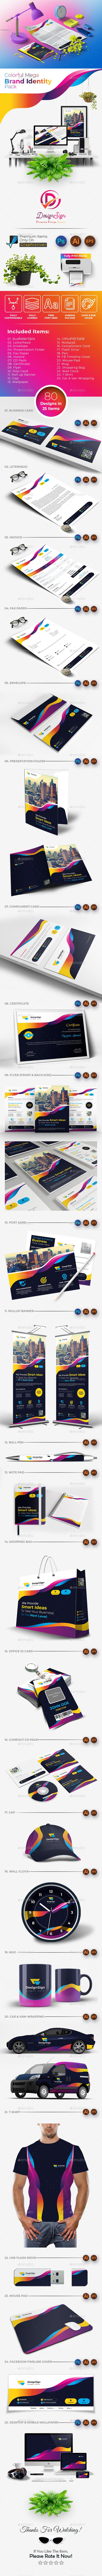 Colorful Mega Branding Identity - Stationery Print Templates